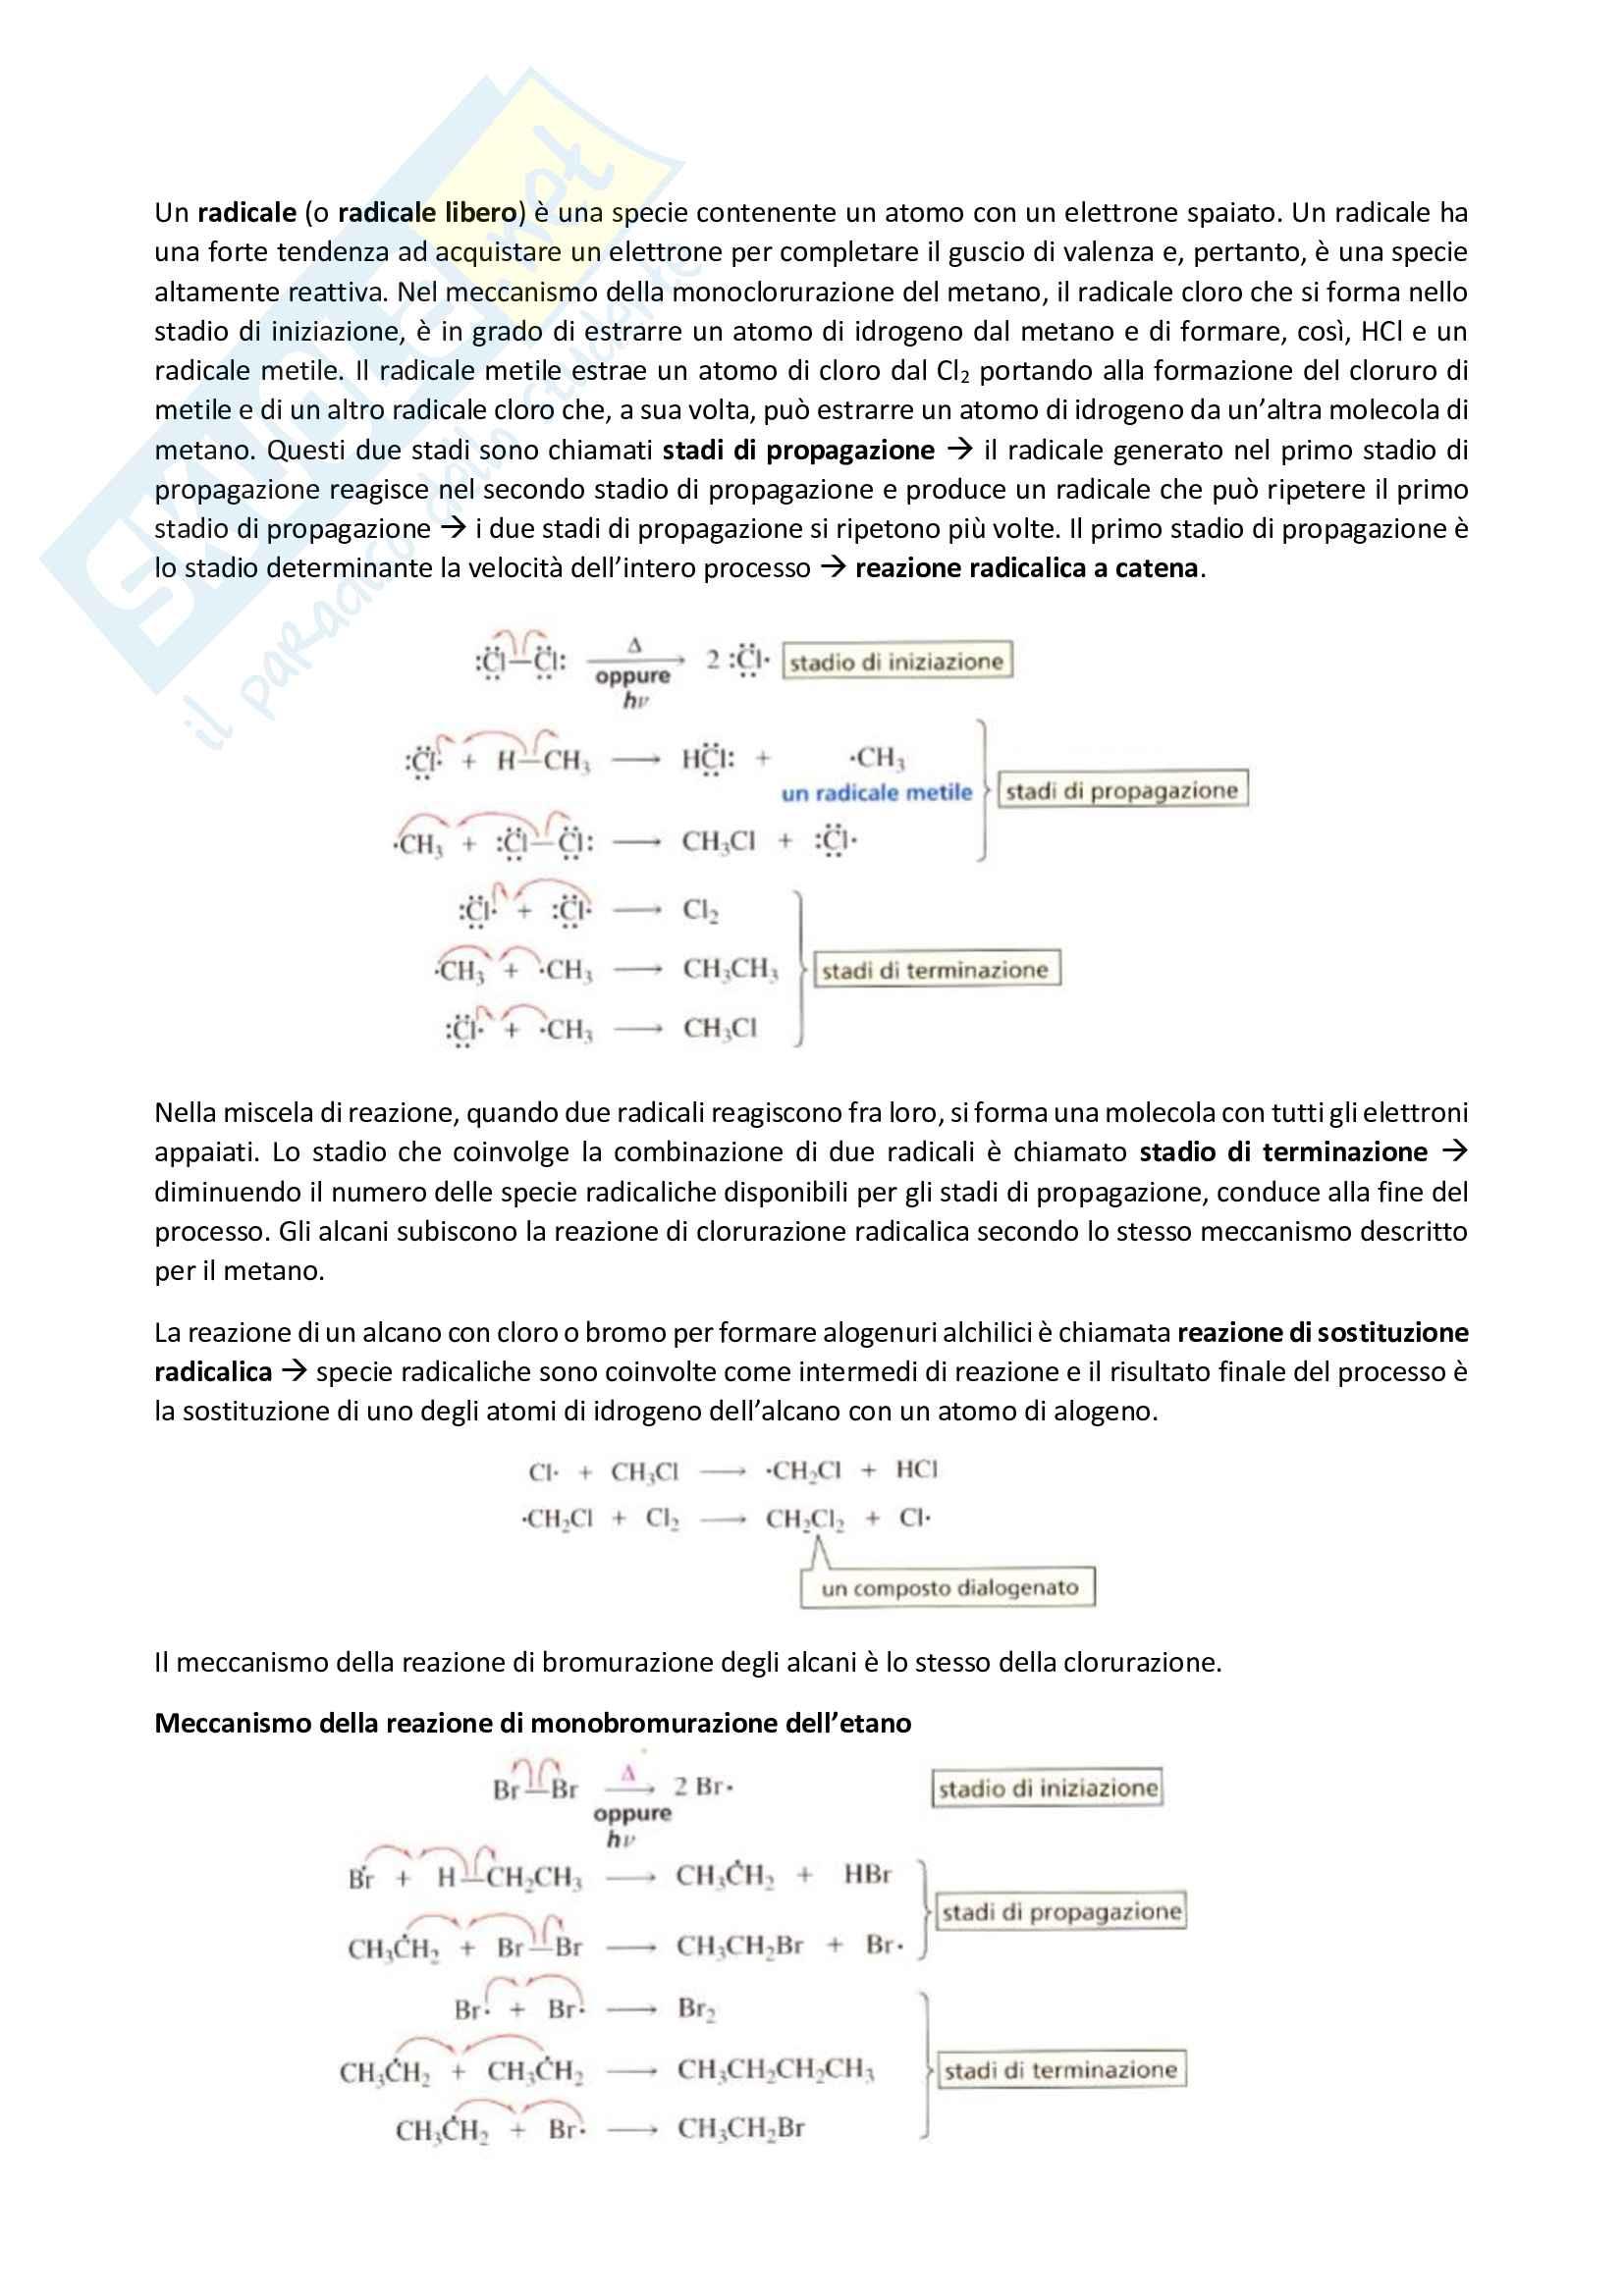 Chimica organica, Reazioni degli alcani - I radicali Pag. 2